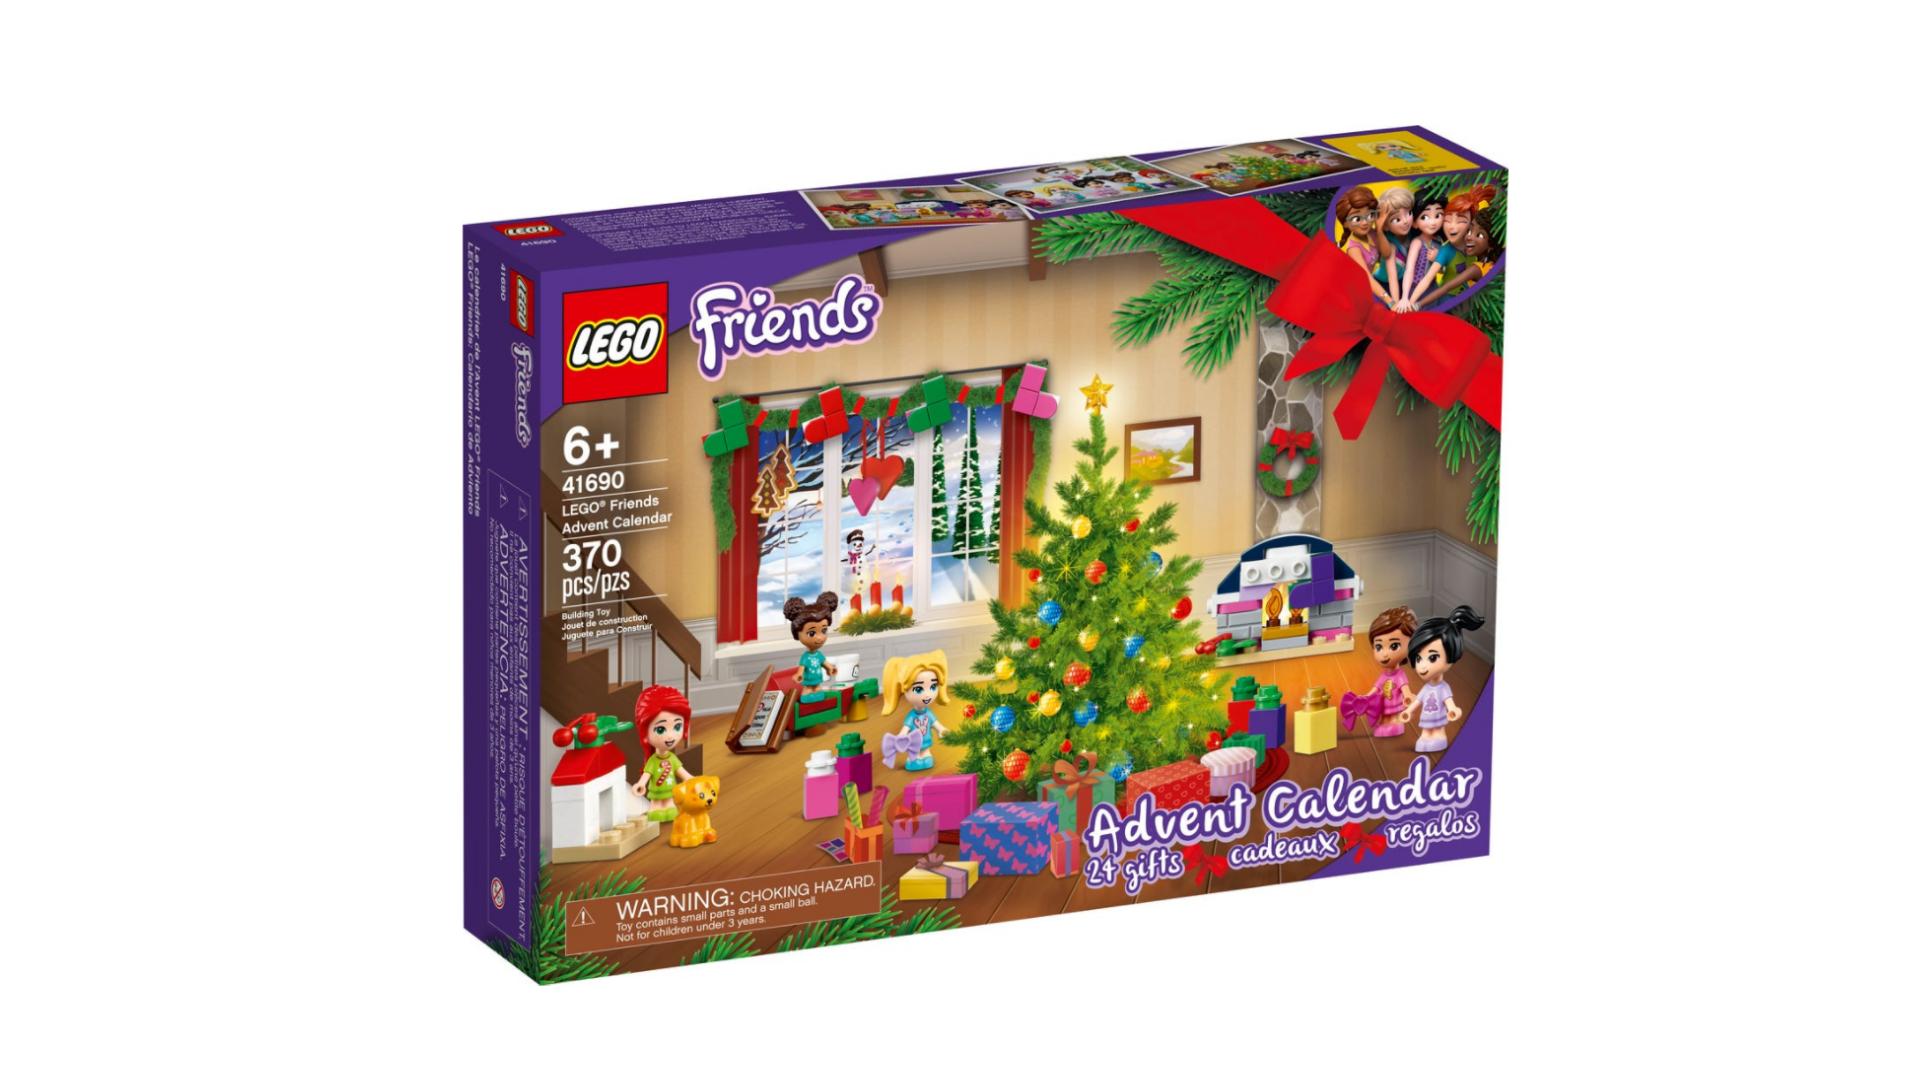 Calendrier de l'avent LEGO Friends 2021